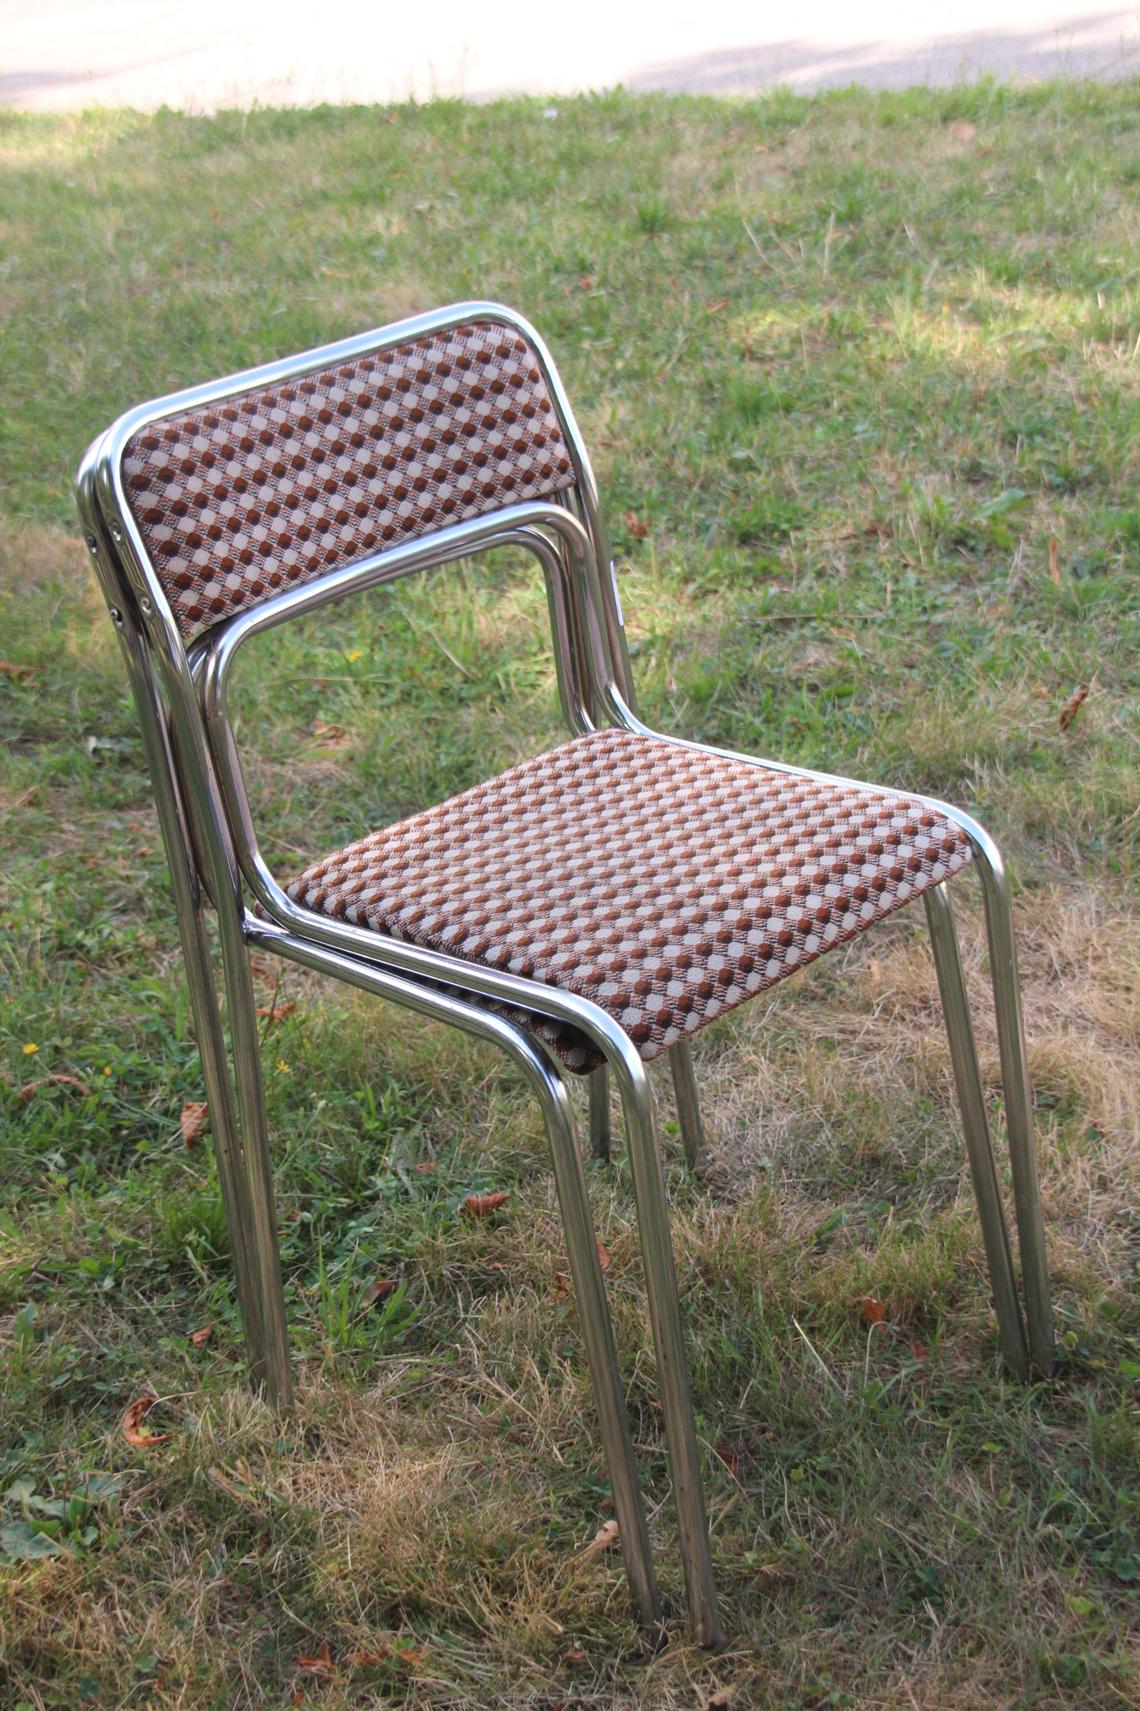 2x gartenhaus stuhl orig ddr leichtmetall holz textil balkon terrasse rohrstuhl ebay. Black Bedroom Furniture Sets. Home Design Ideas